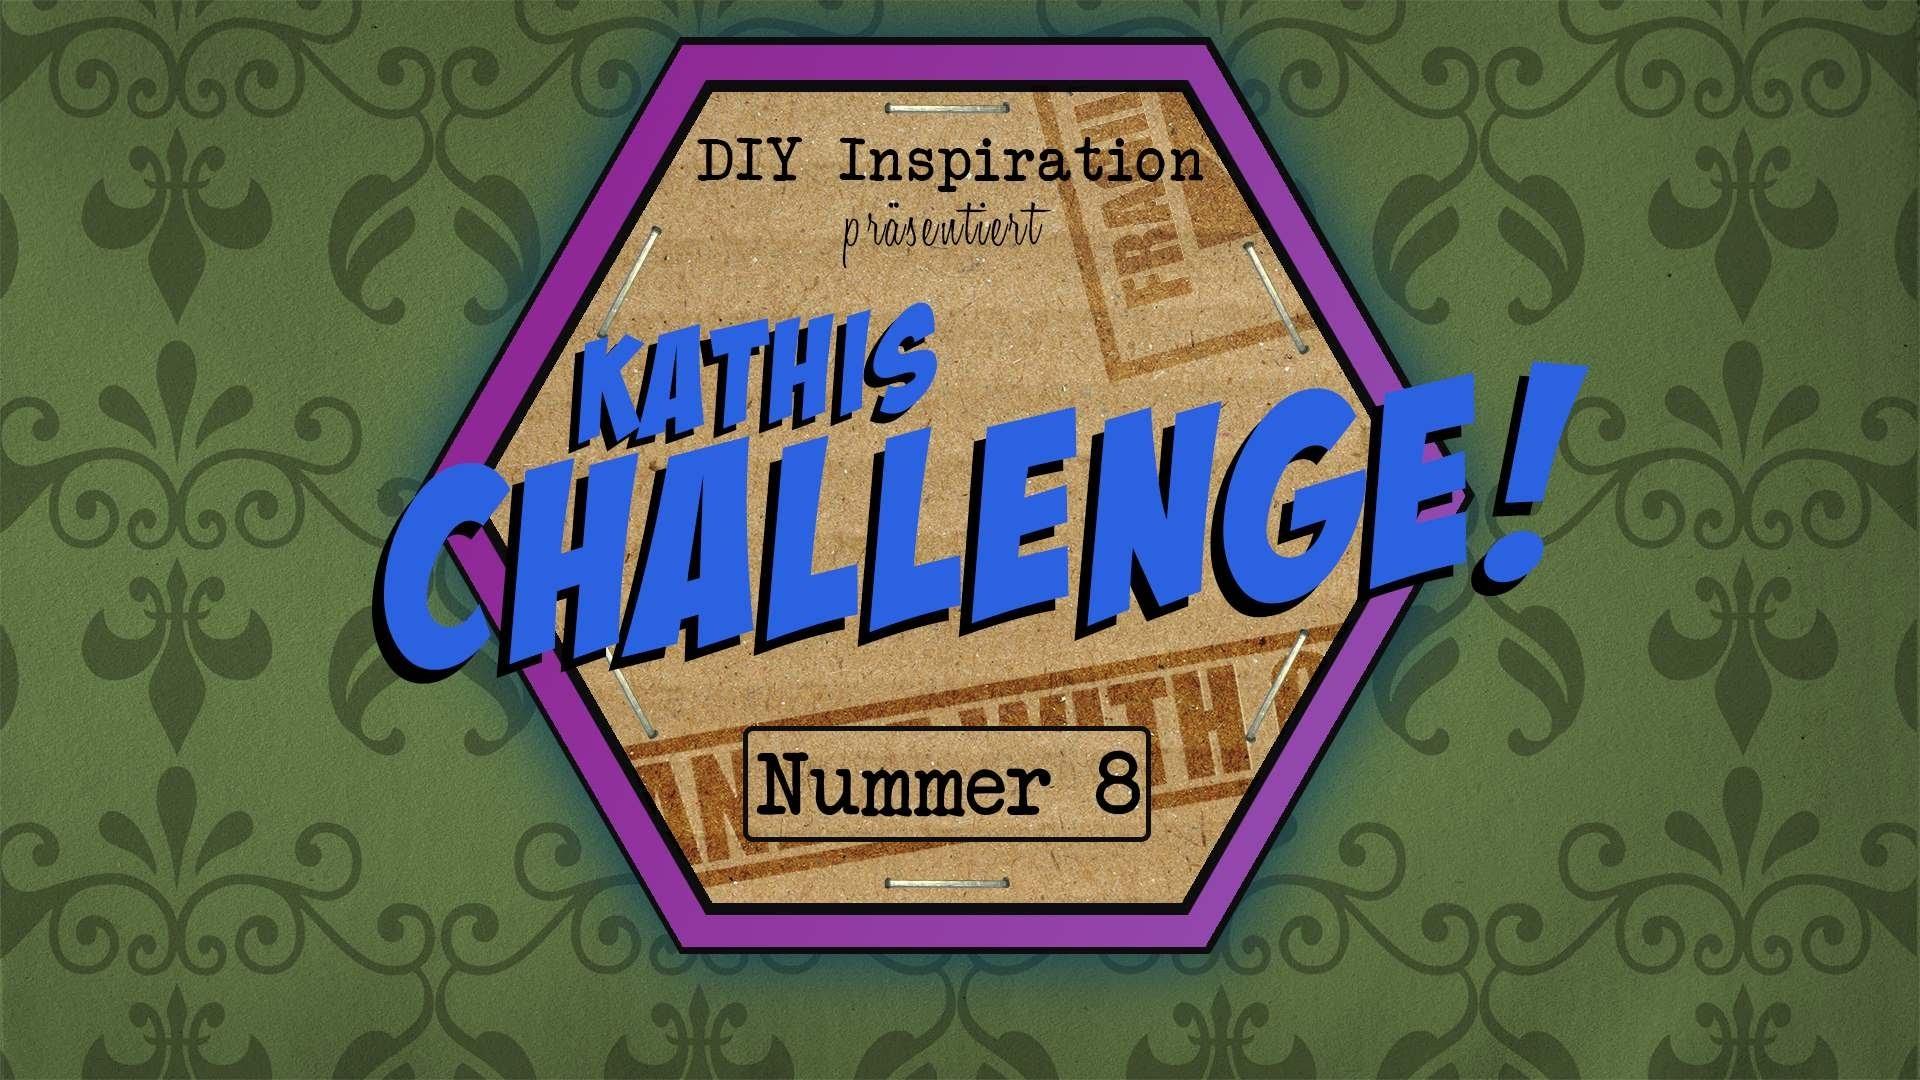 DIY Inspiration Challenge #8 Cocktails | Eva und Kathi's Challenge | Do It Yourself Tutorial